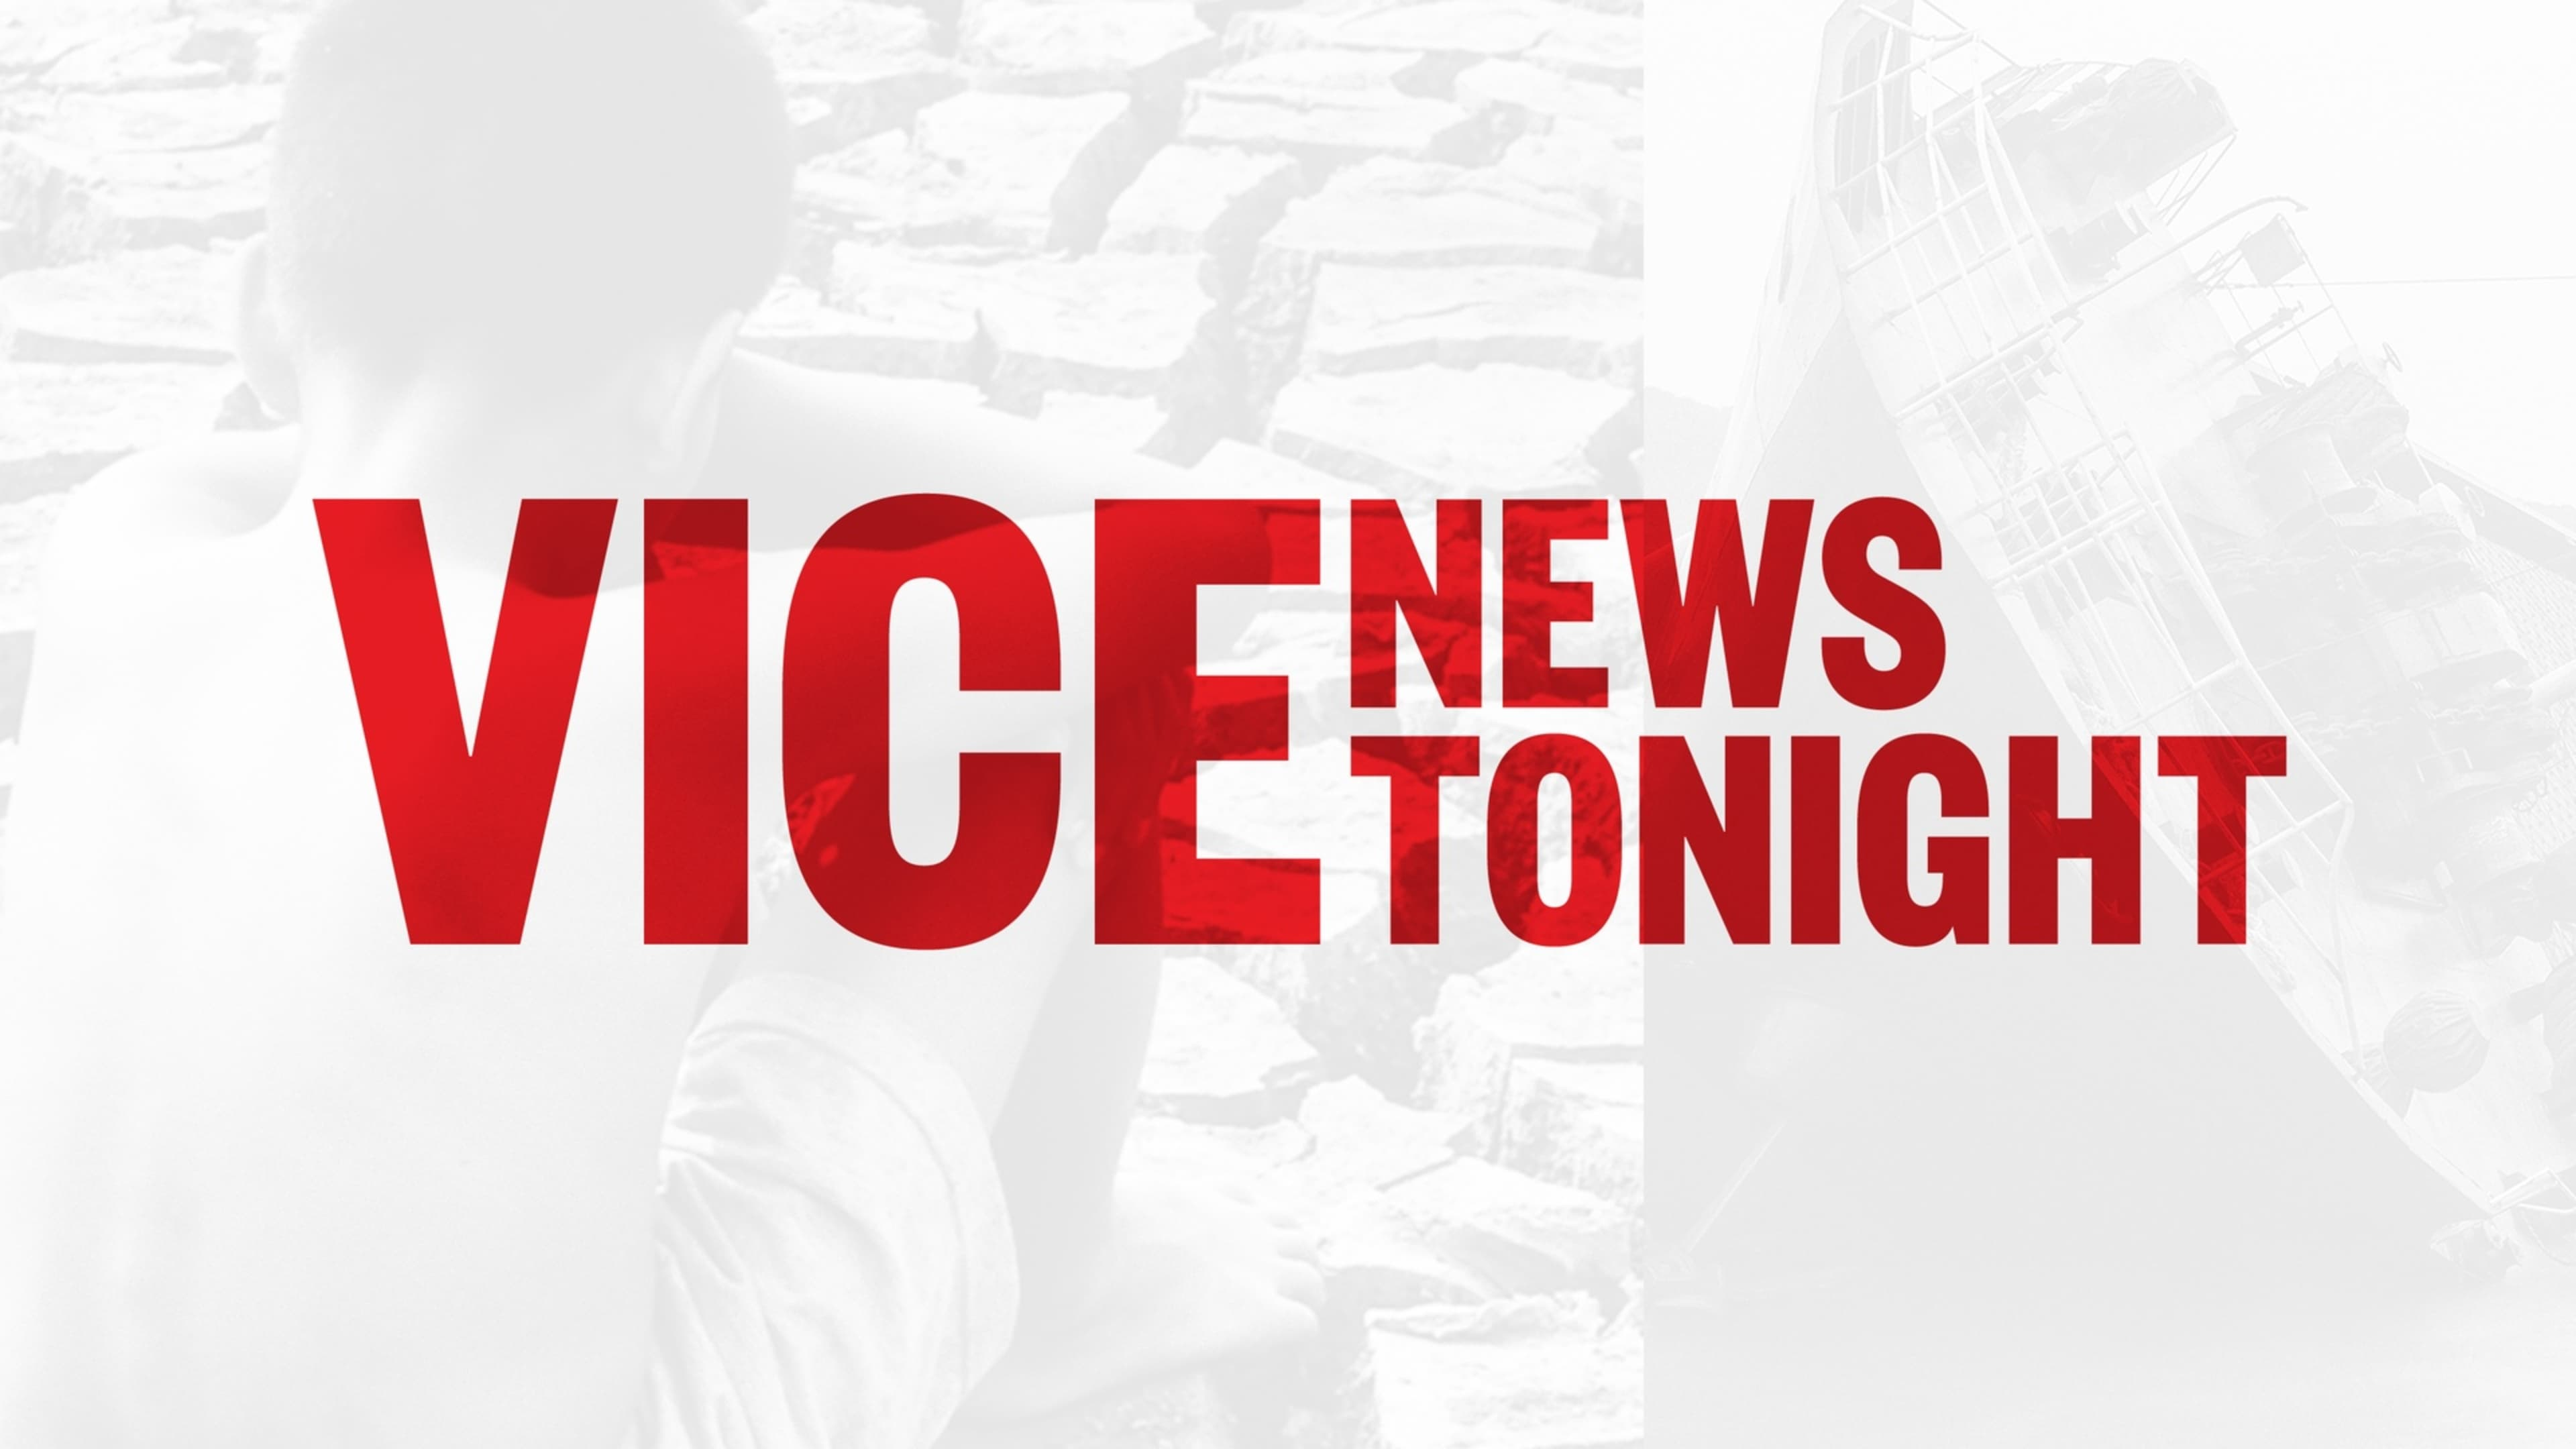 VICE News Tonight